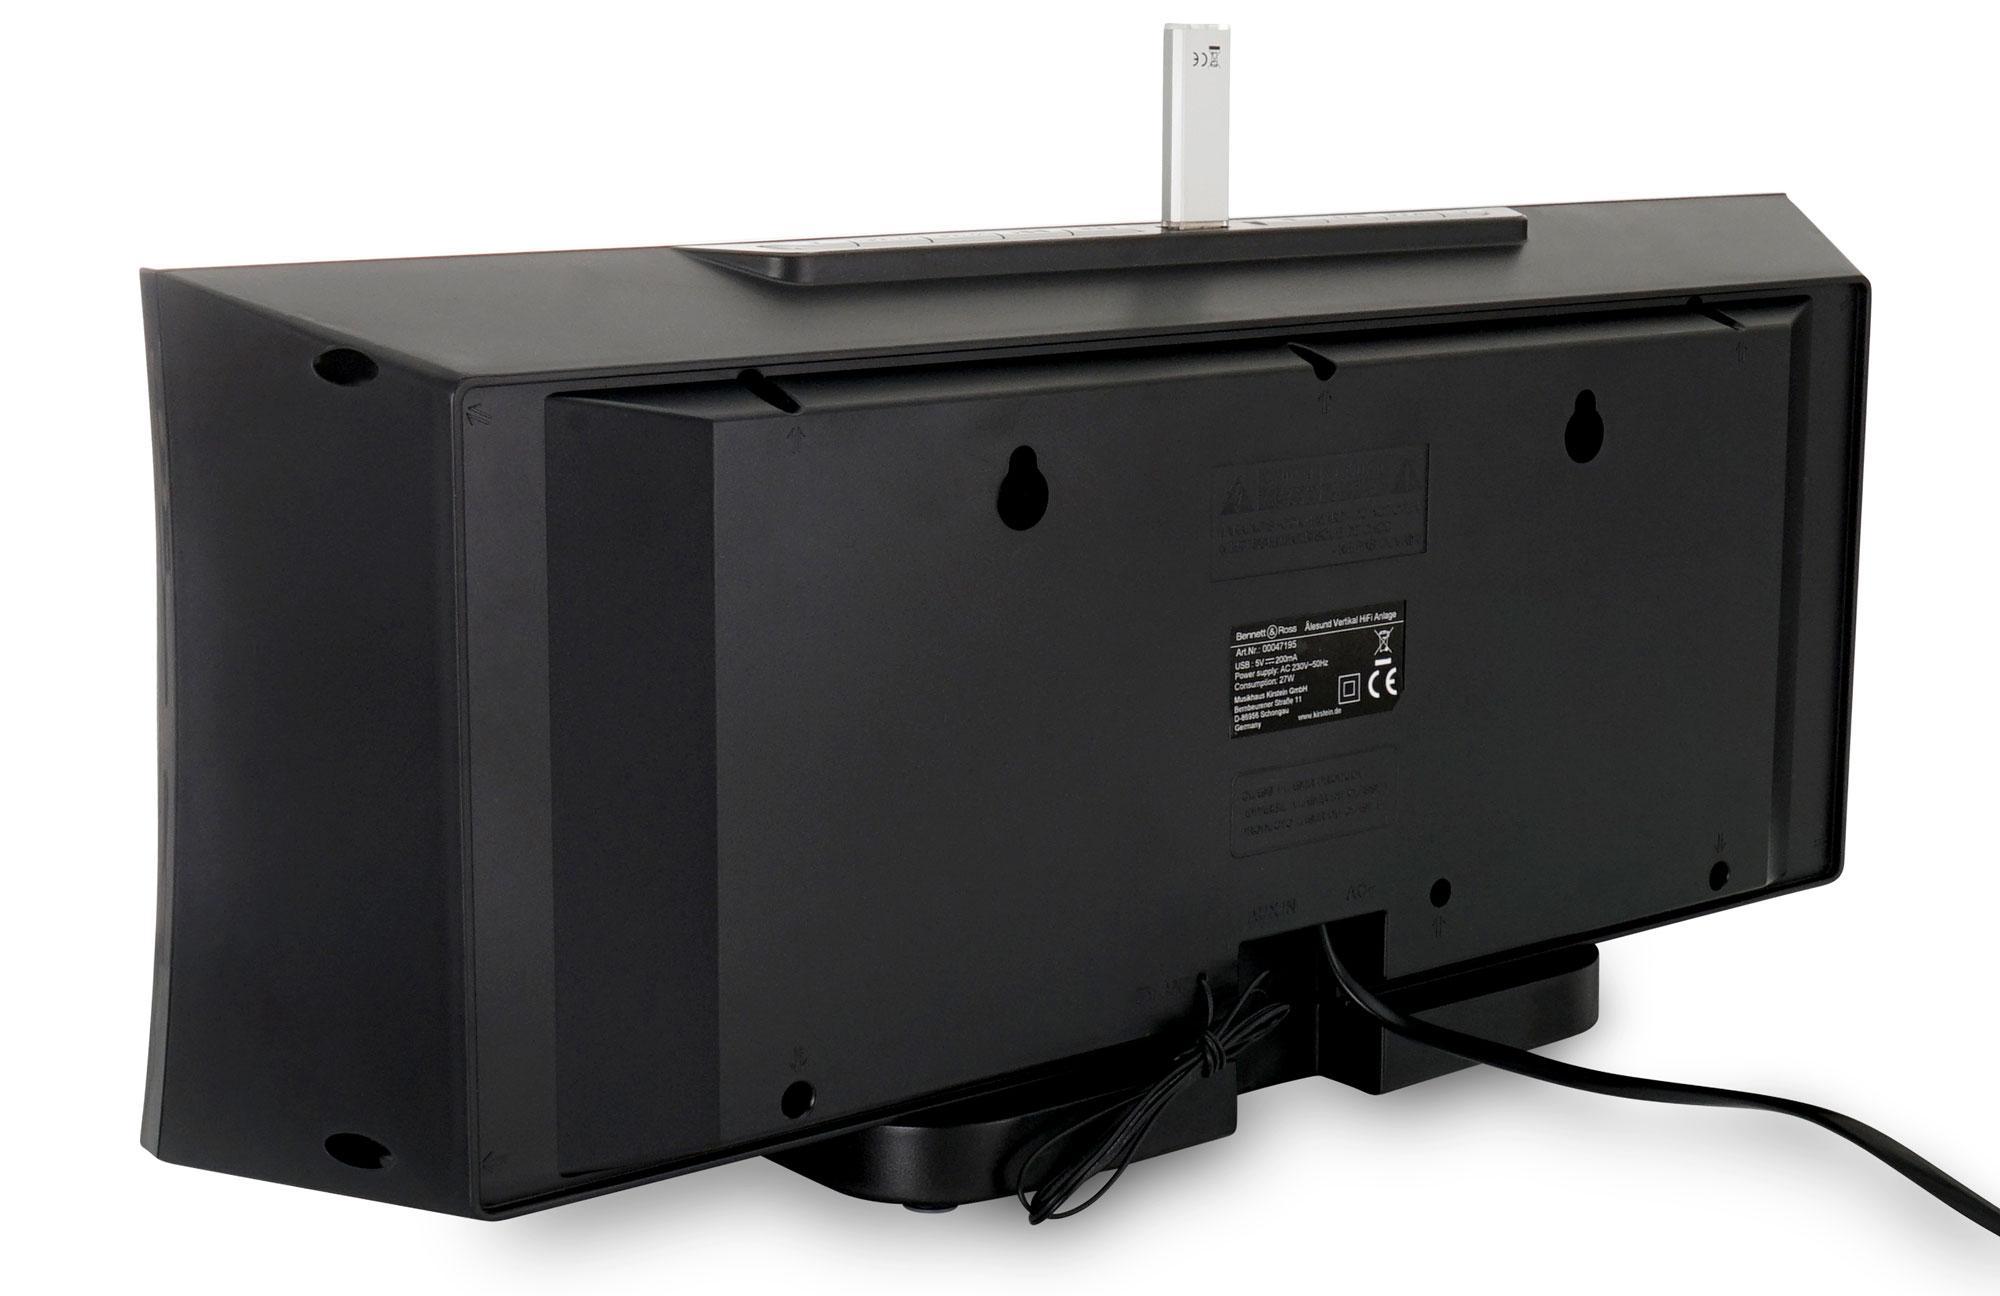 bennett ross lesund vertikal stereoanlage mit cd mp3. Black Bedroom Furniture Sets. Home Design Ideas